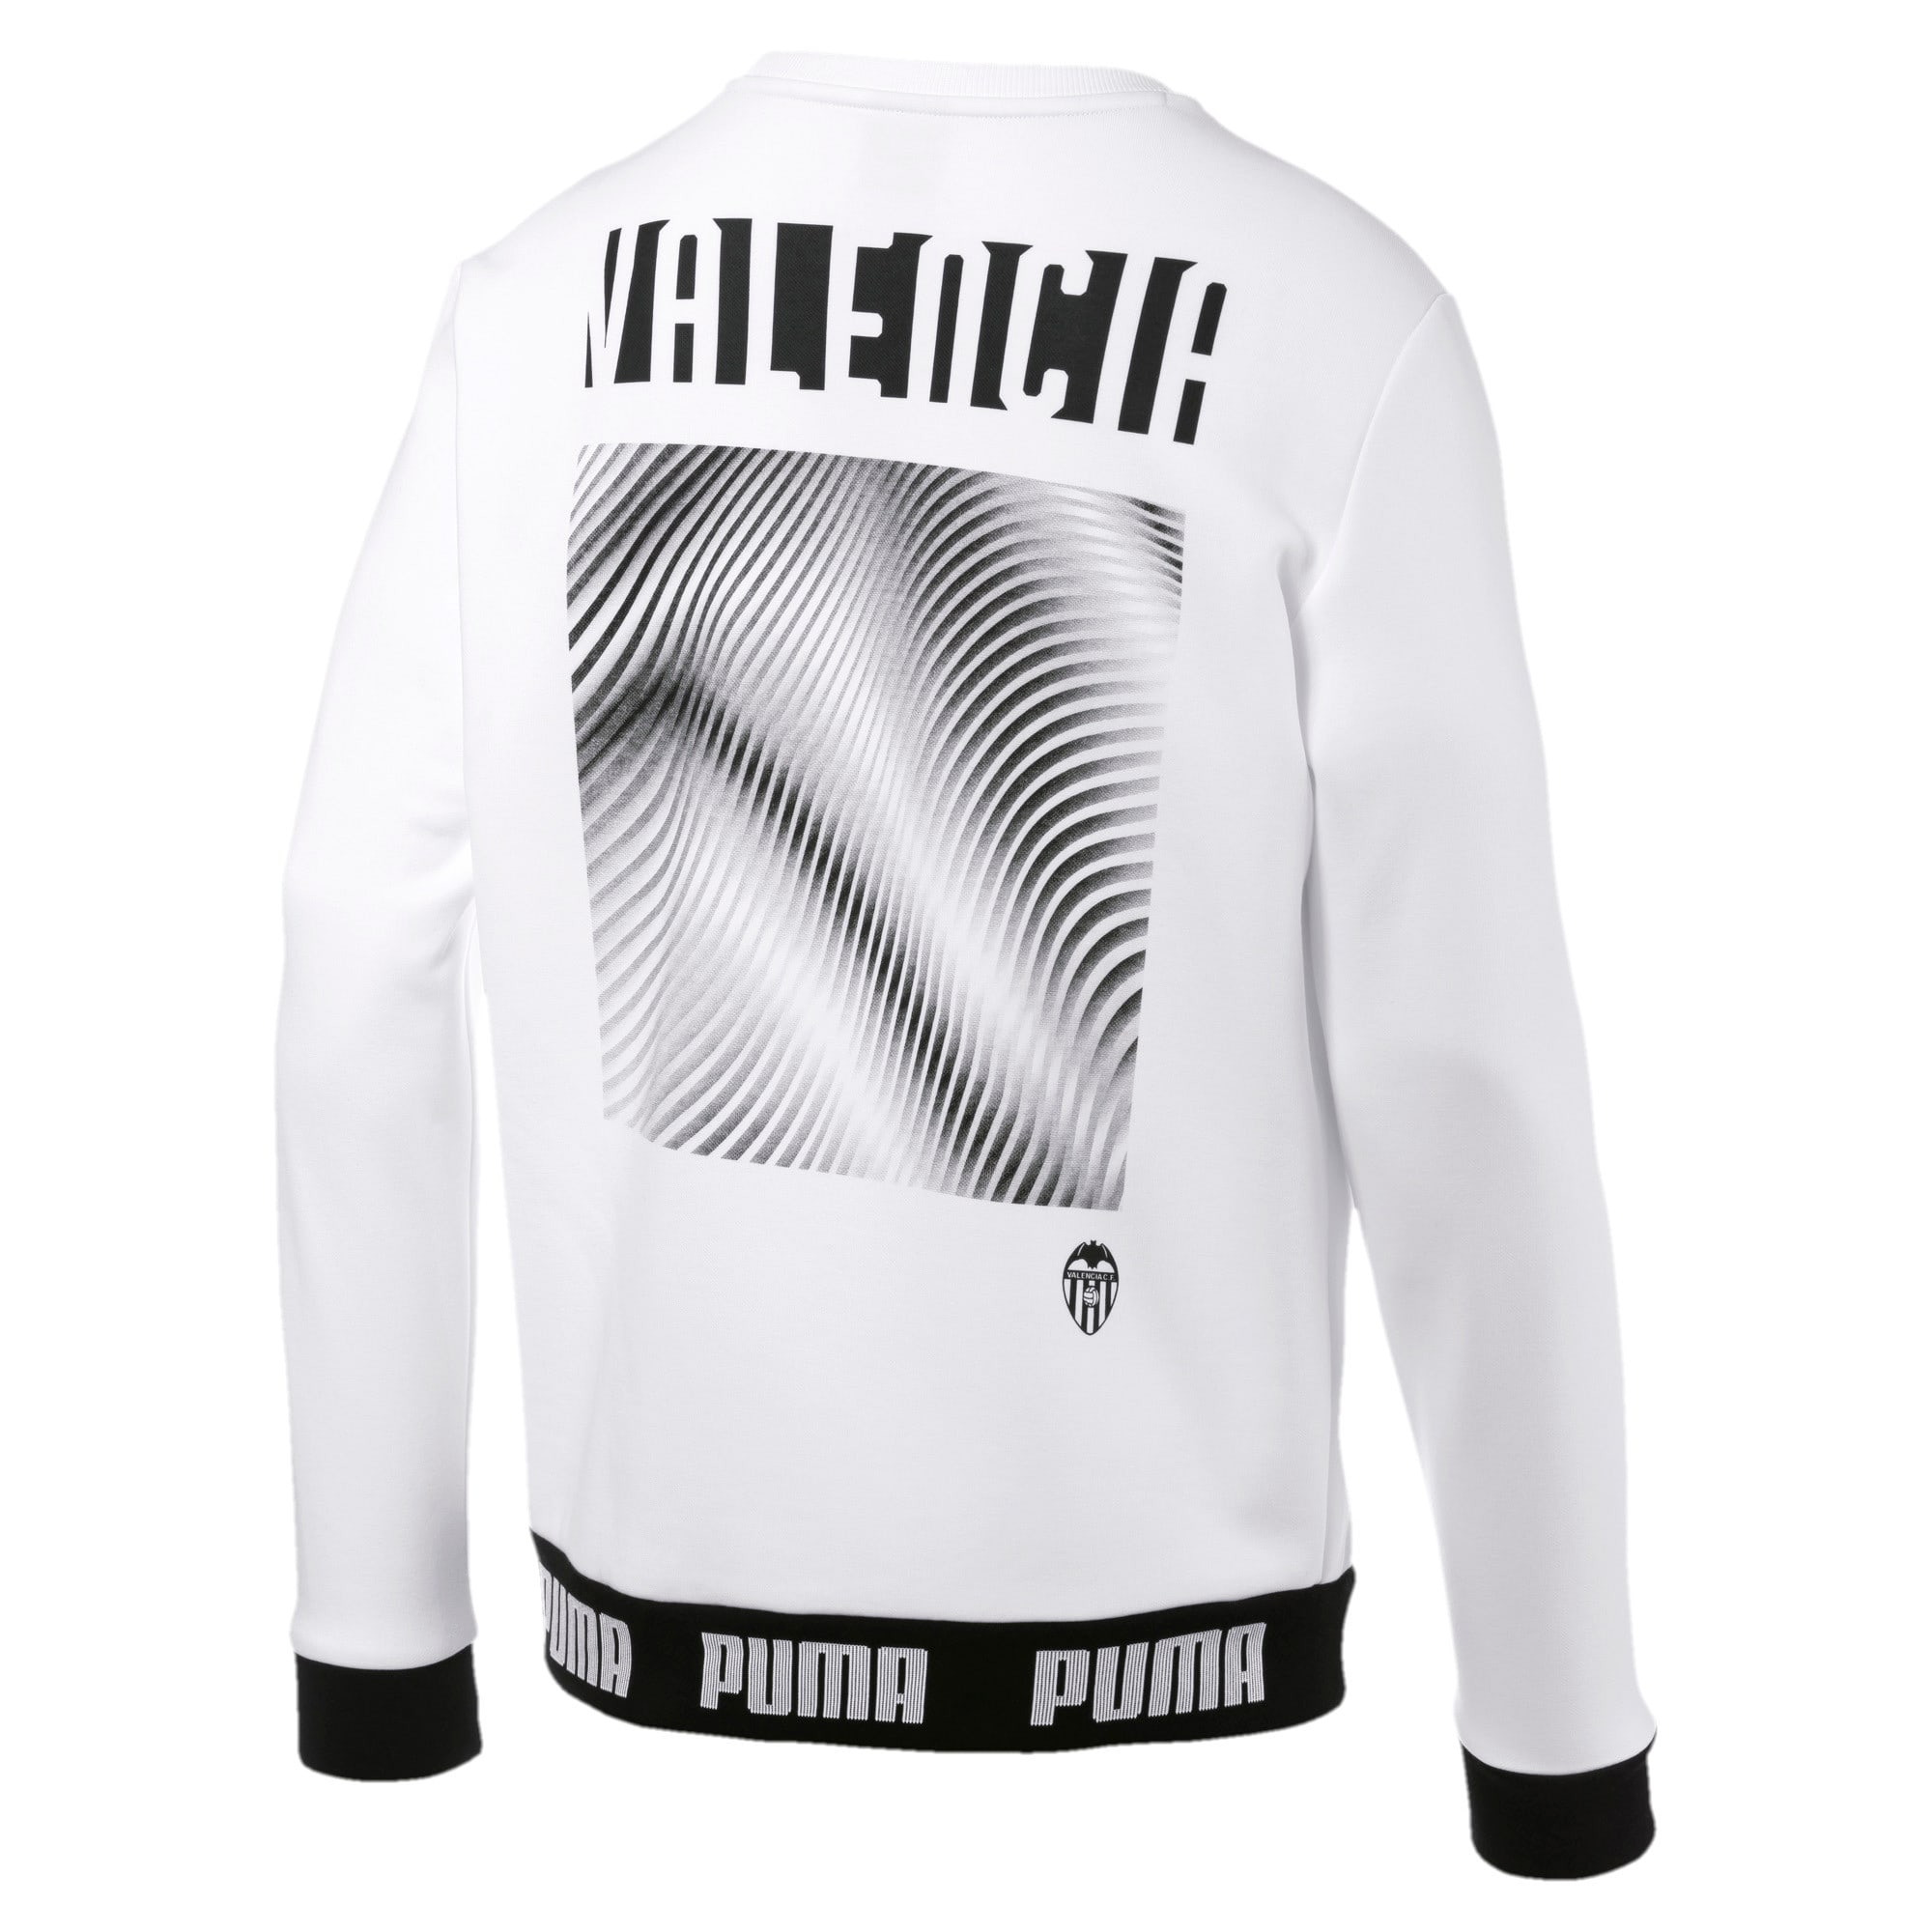 Thumbnail 2 of Valencia CF Football Culture Men's Sweater, Puma White, medium